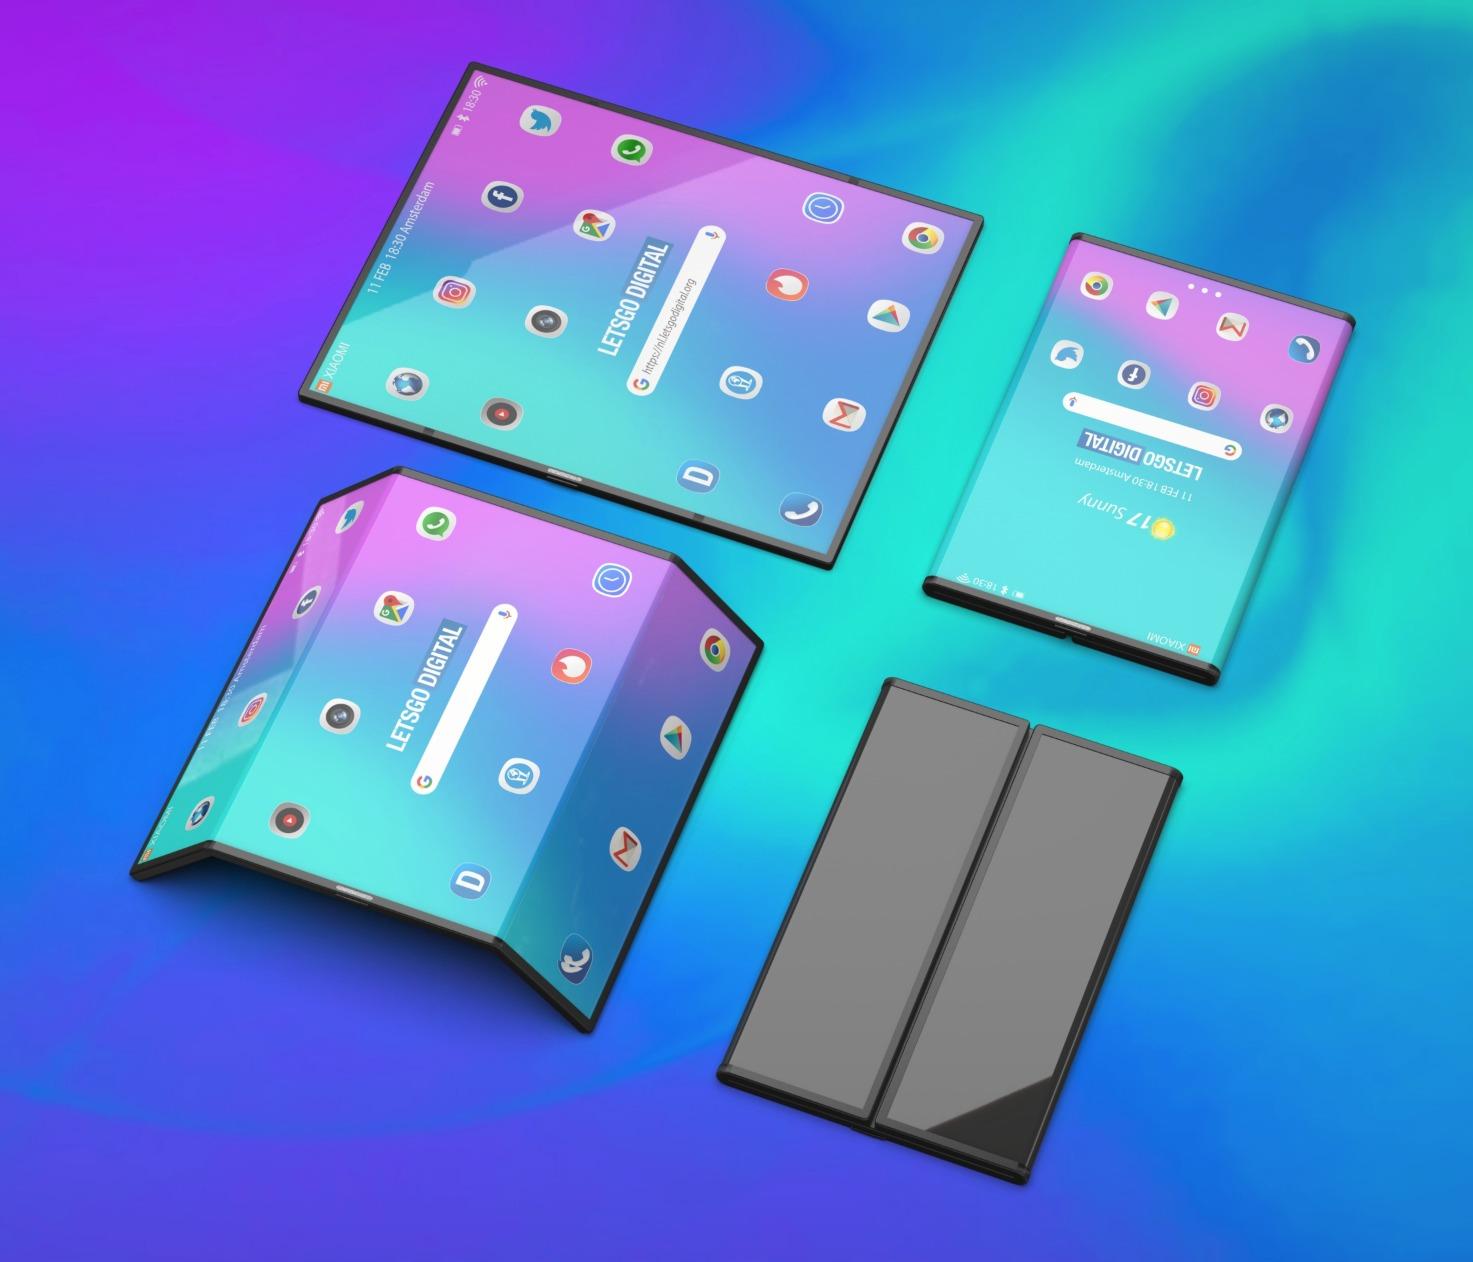 Xiaomi Falt Smartphone Konzept